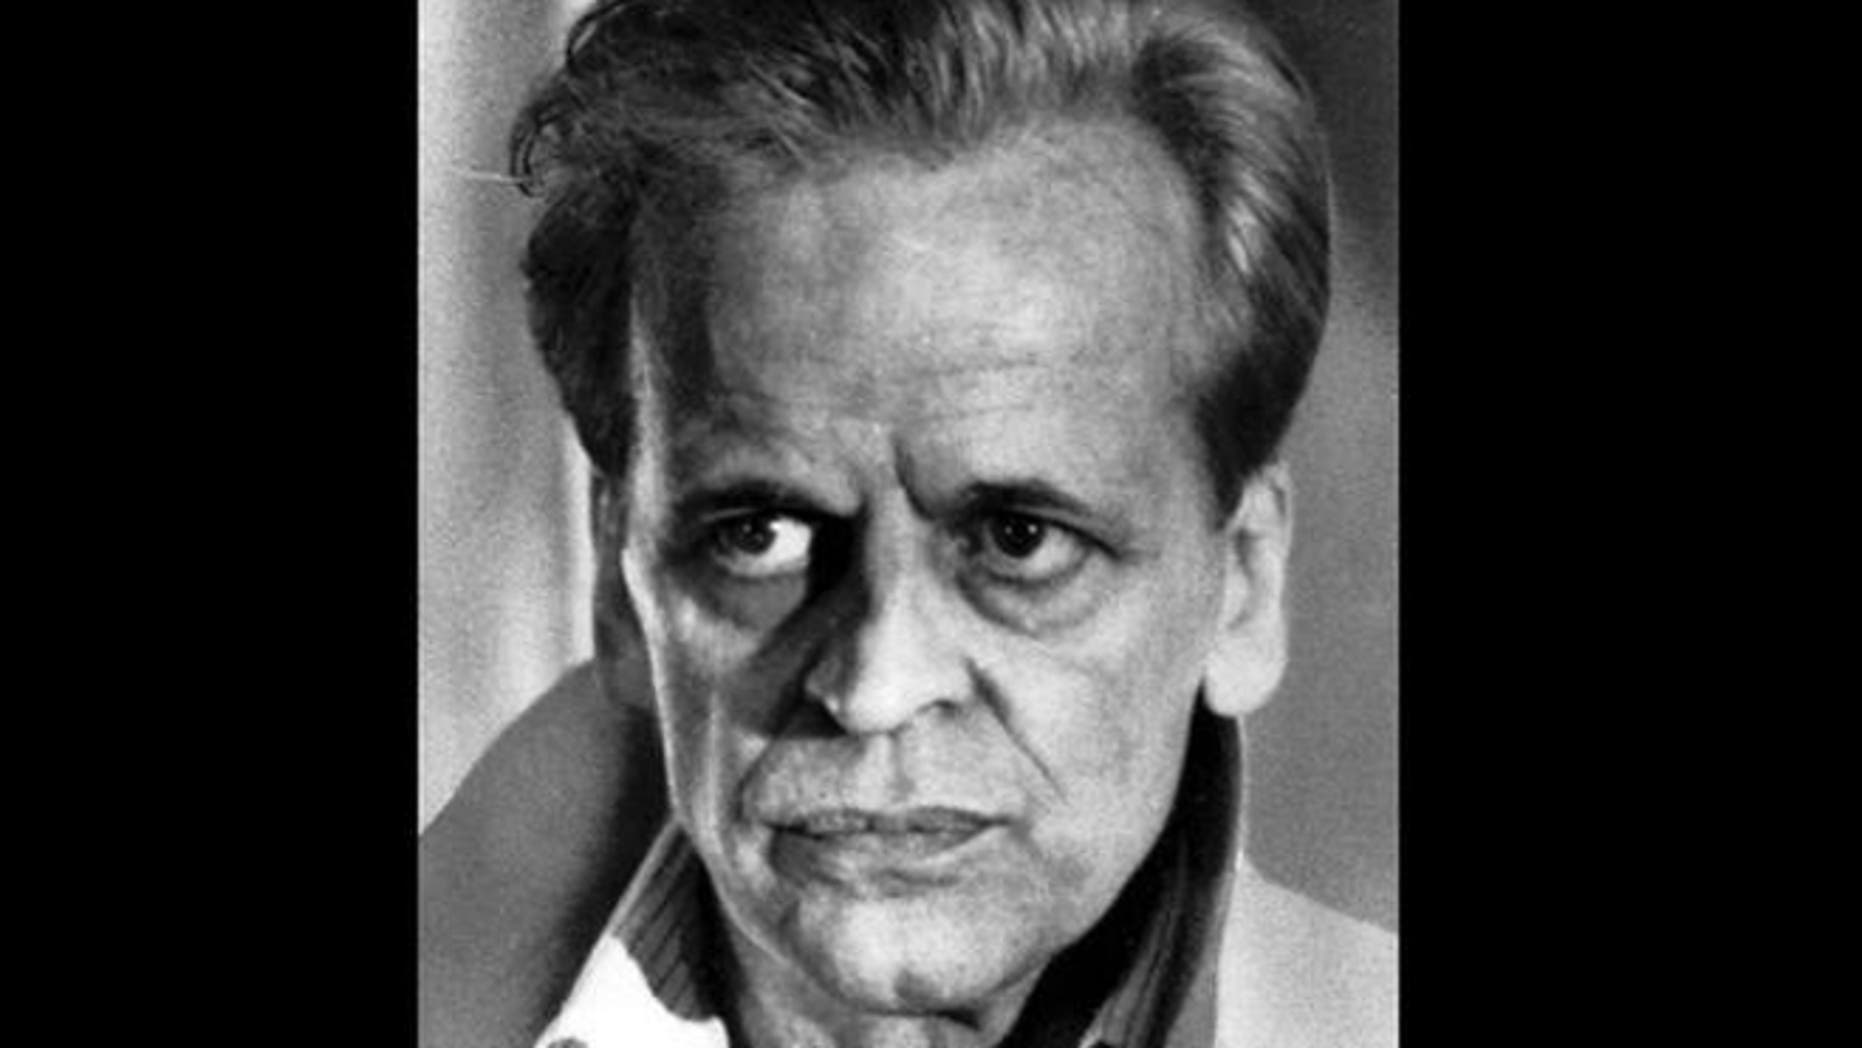 A 1982 headshot of actor Klaus Kinski.